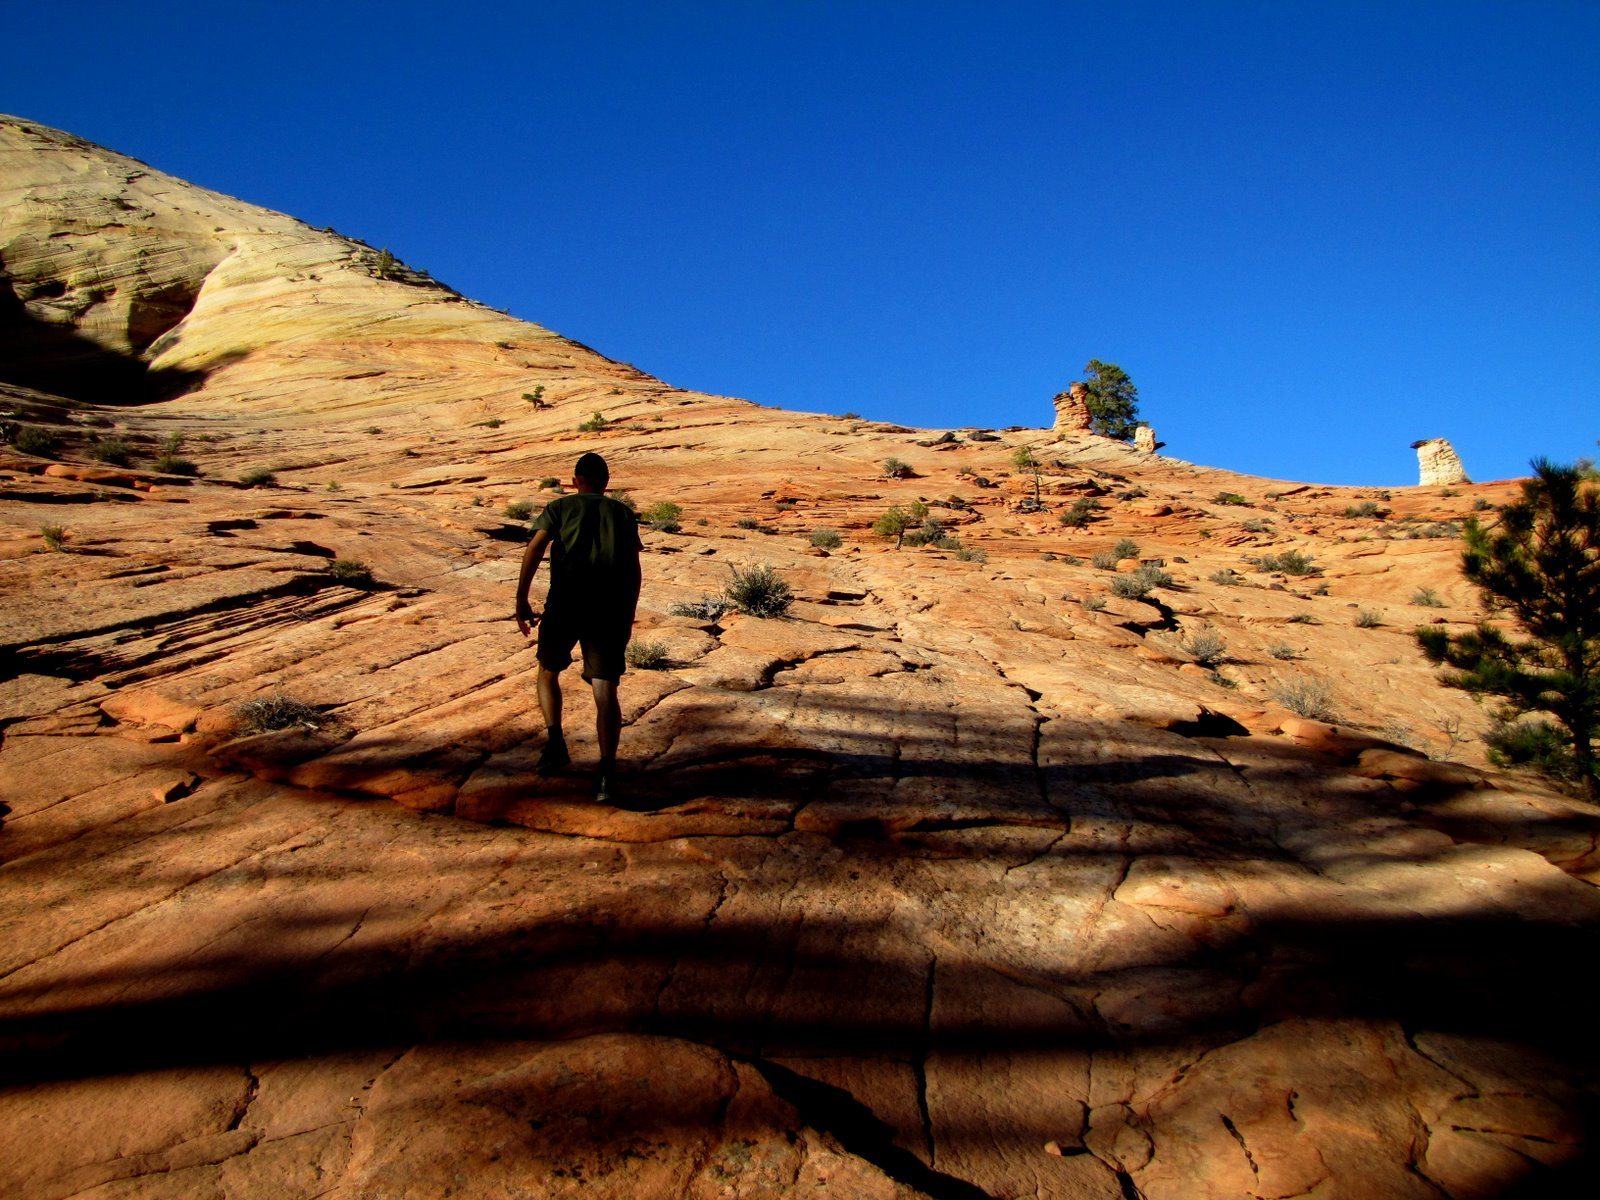 Mászunk fel a gerincre  Climbing up to the ridge